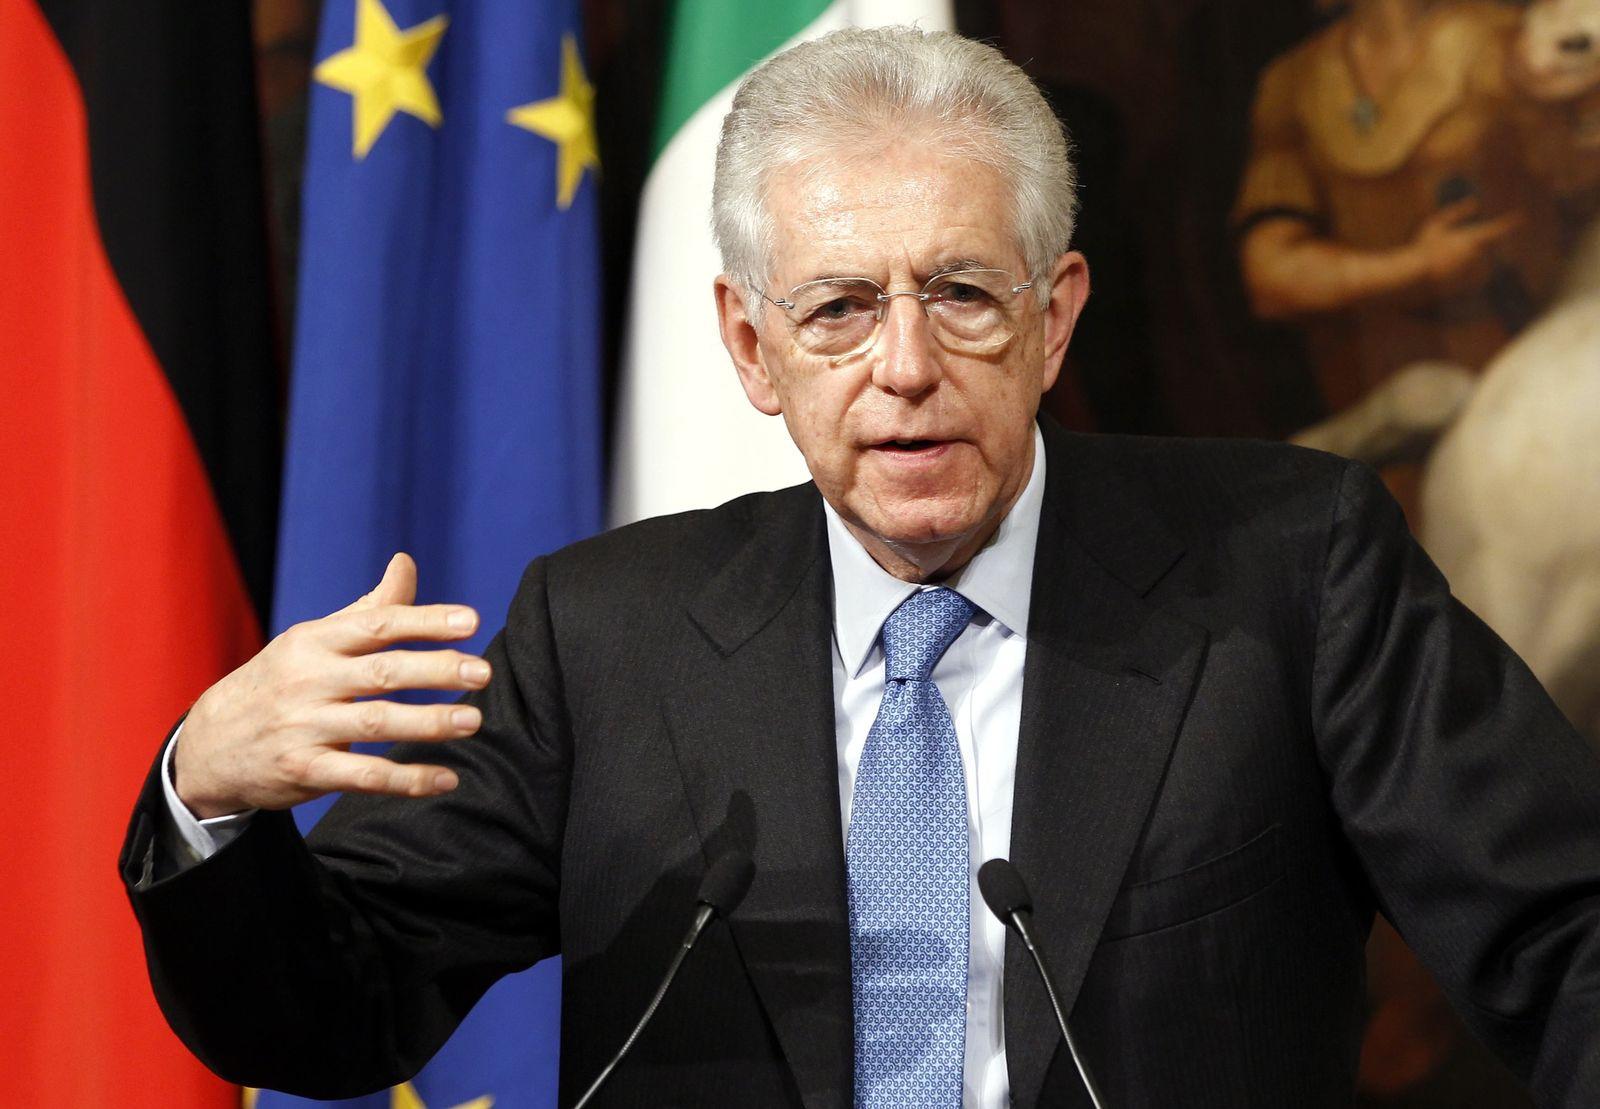 Mario Monti gestikuliert